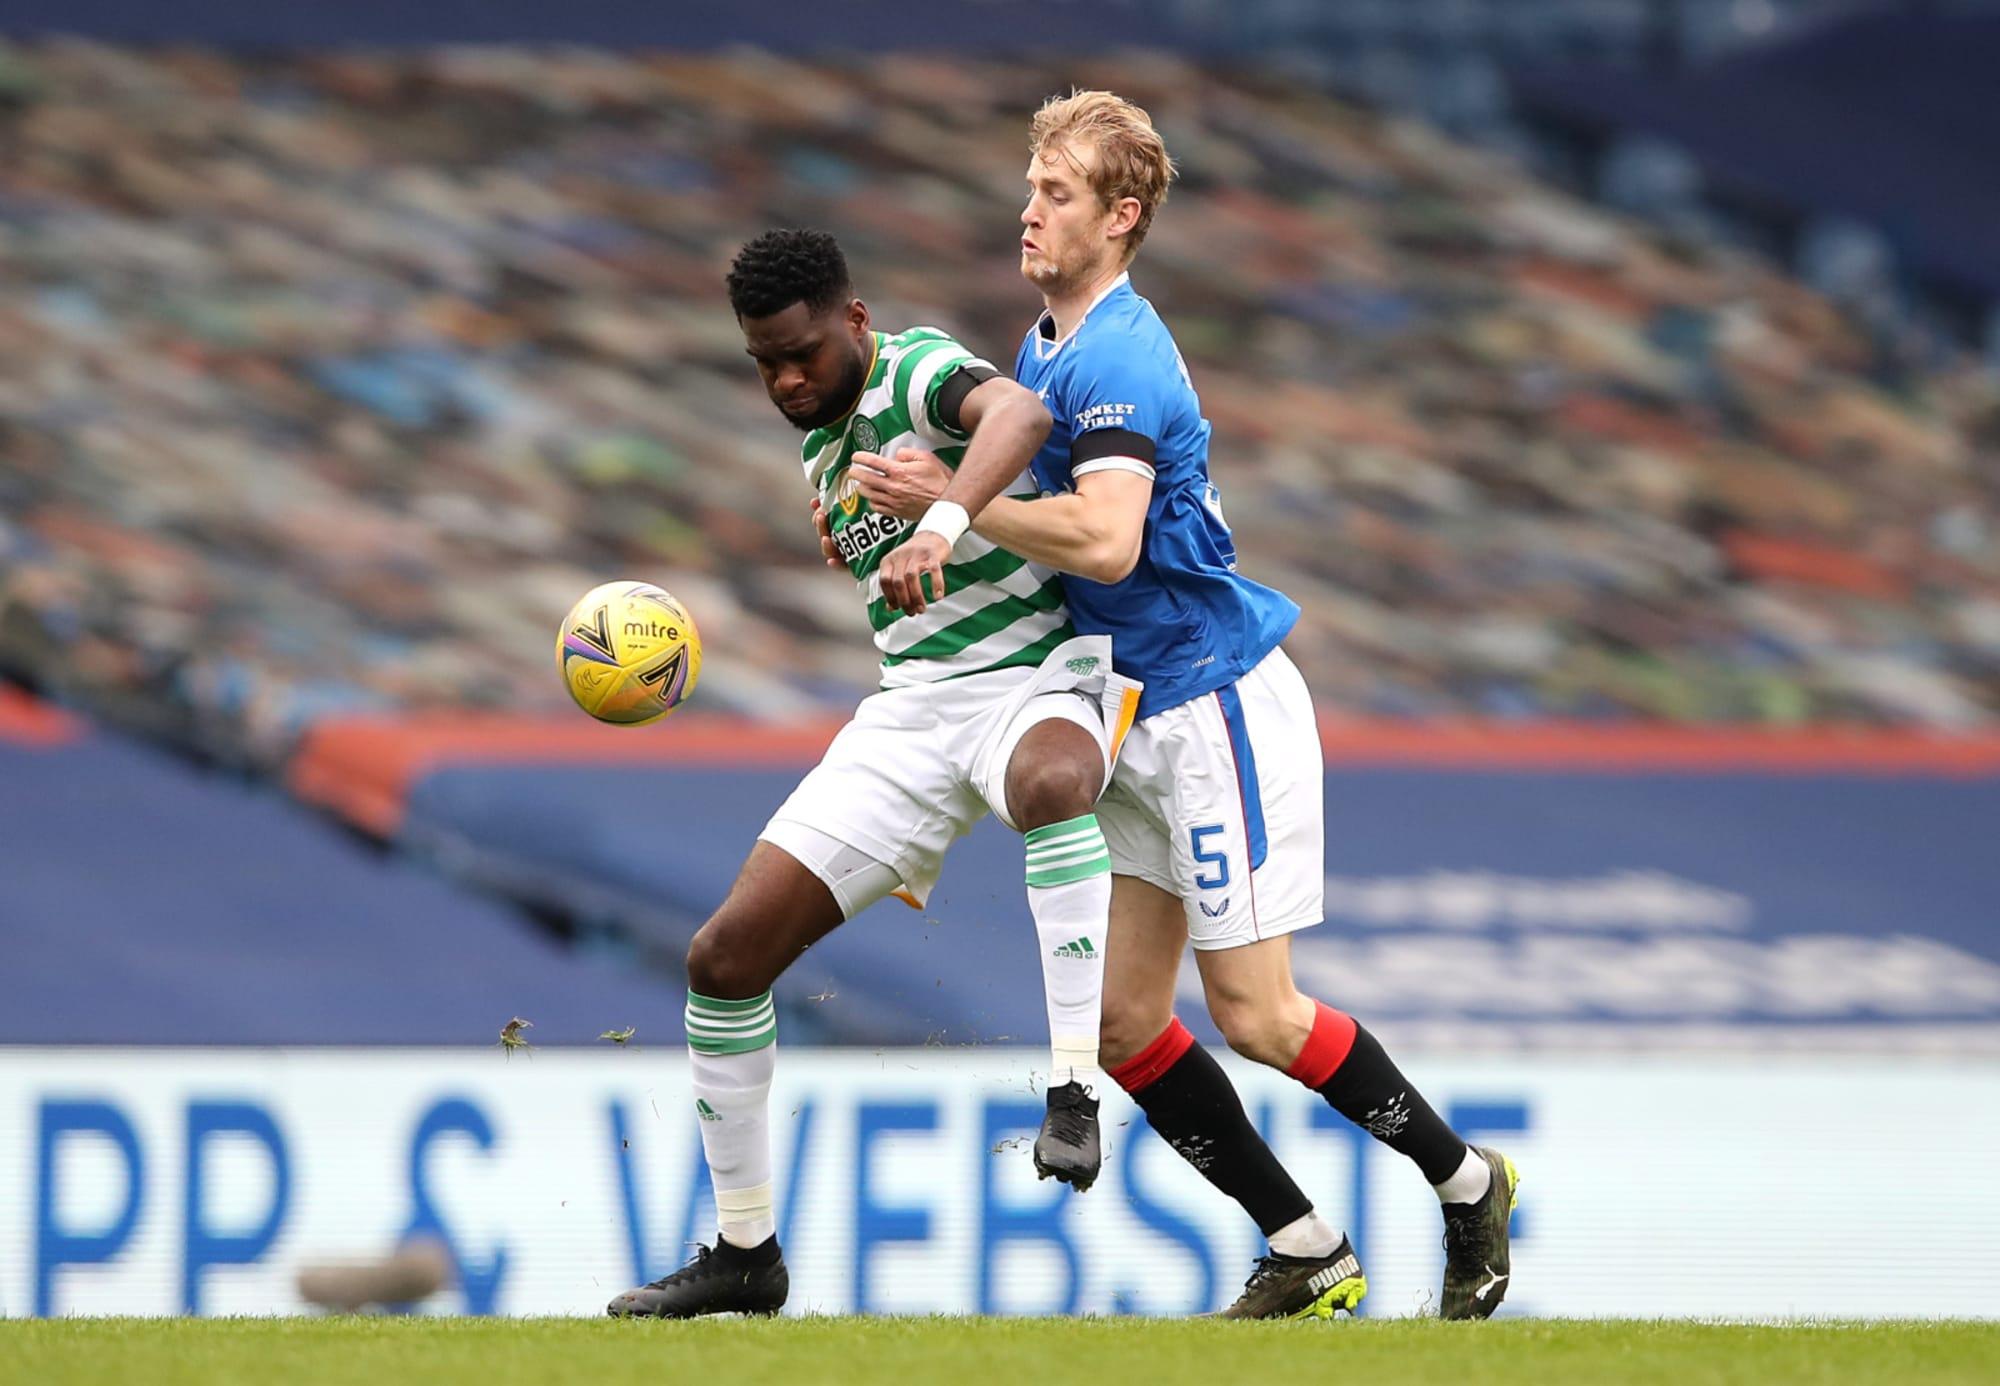 Chris Sutton gives worrying Celtic verdict after Glasgow Derby defeat